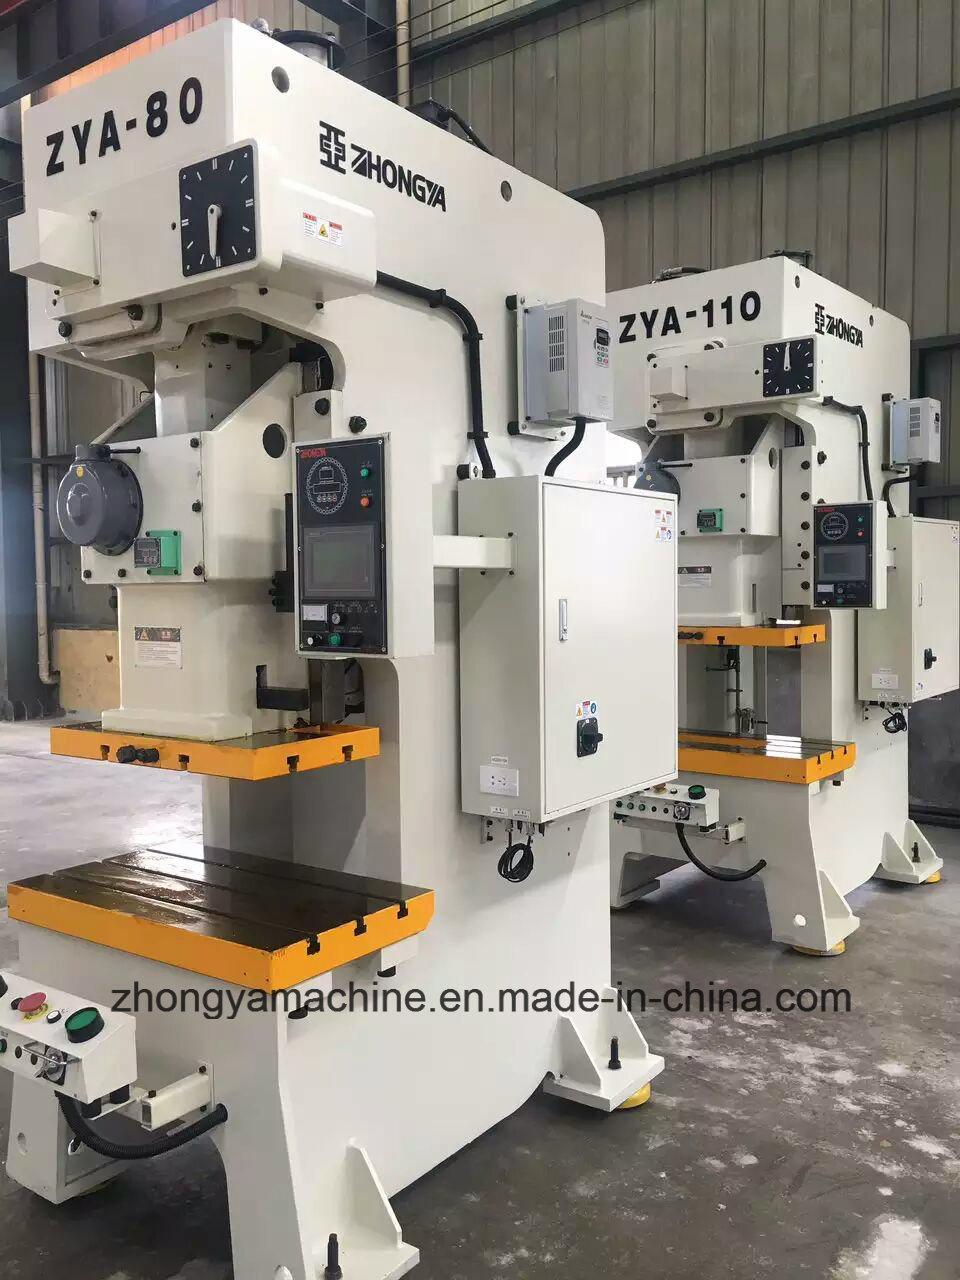 China High-Precision Pneumatic Power Press Machine Zya-80ton